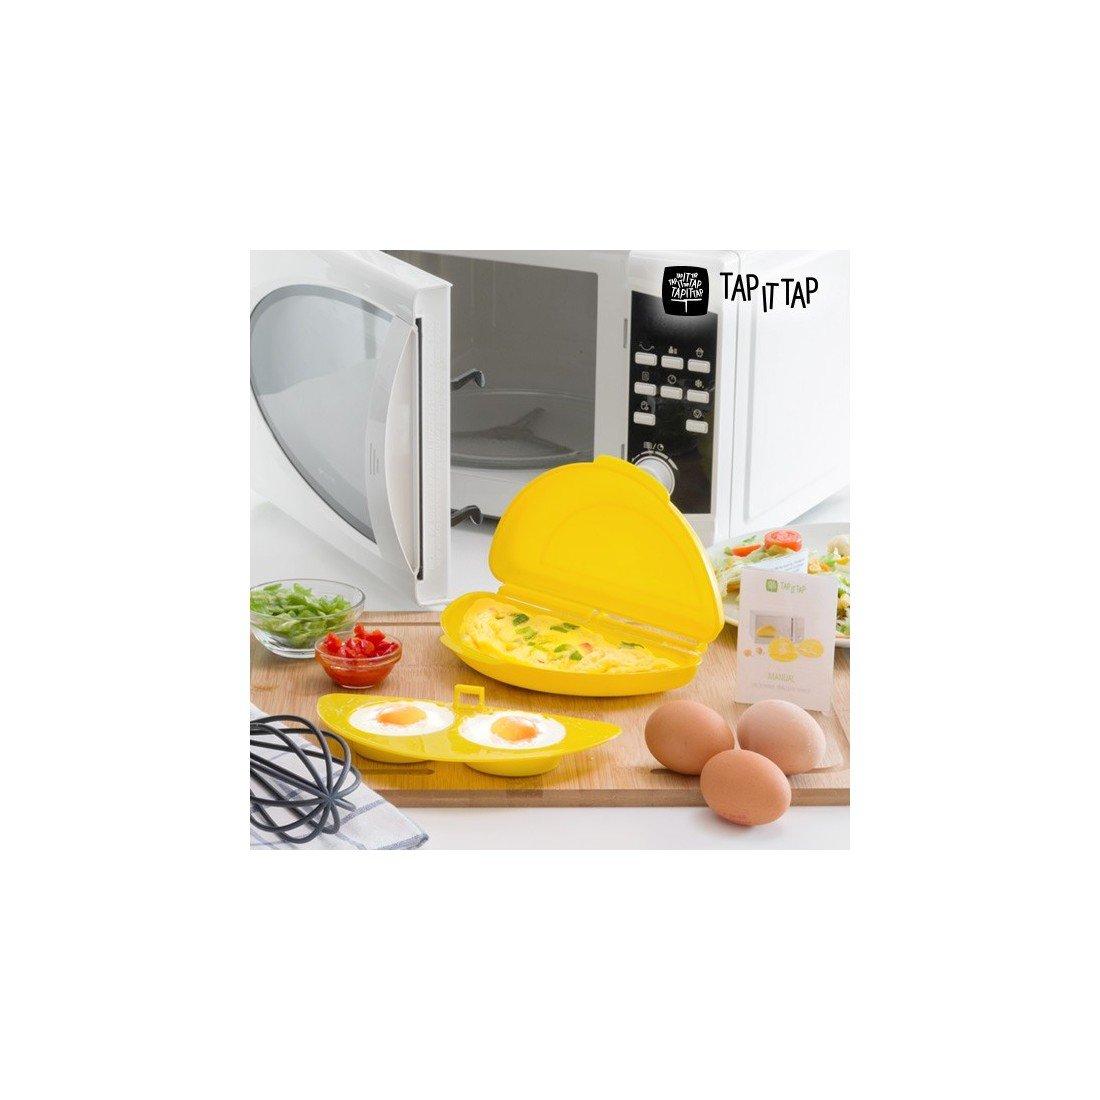 Padella per Frittata per Microonde Tap It Tap Appetitissime V0100417